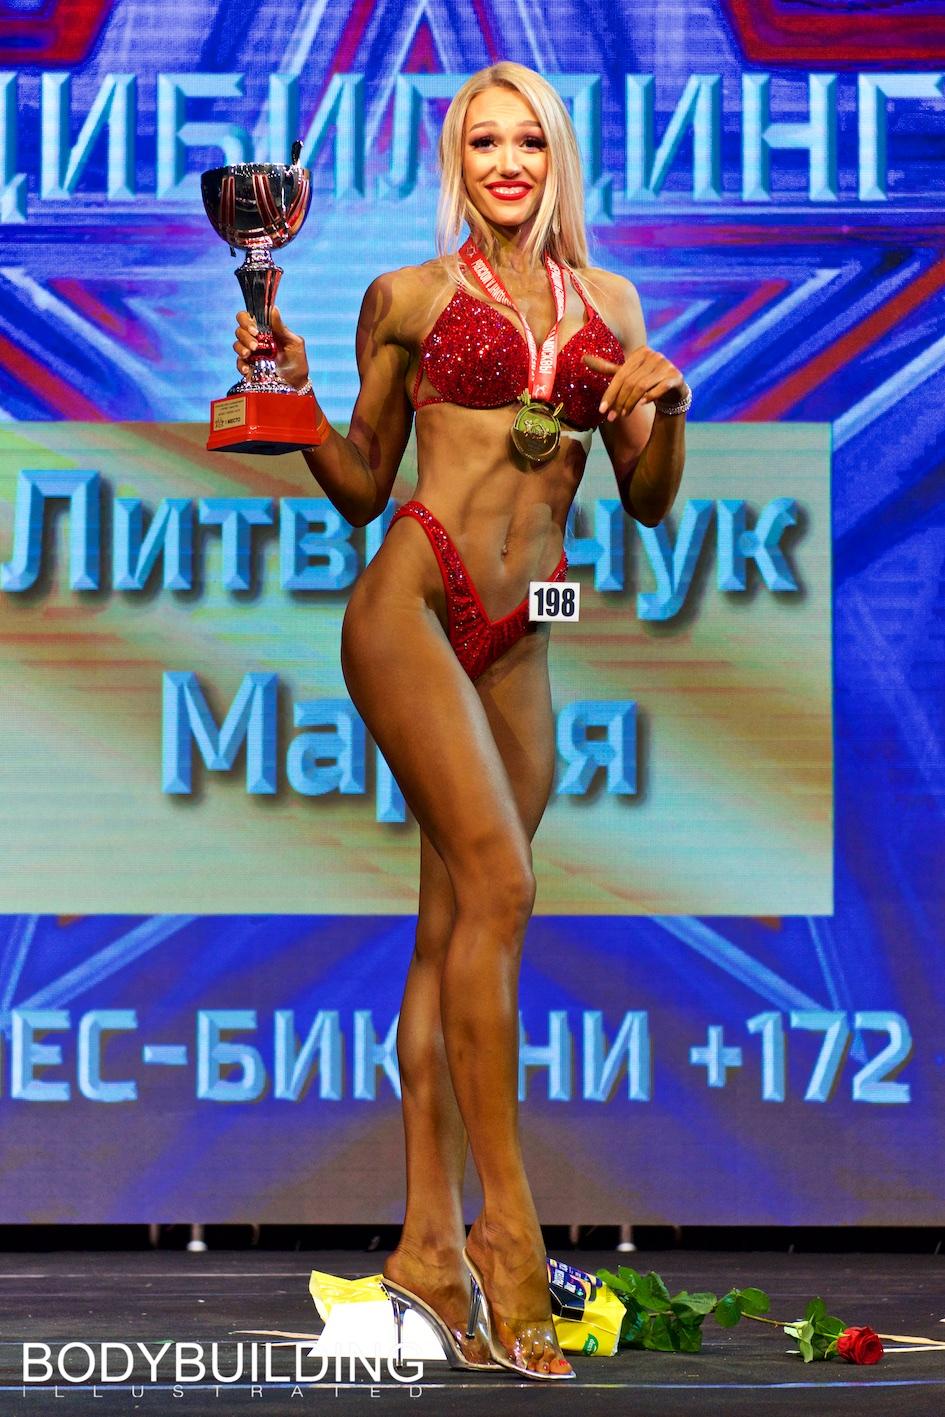 Литвинчук Мария Кубок Москвы по бодибилдингу 2019 фитнес-бикини